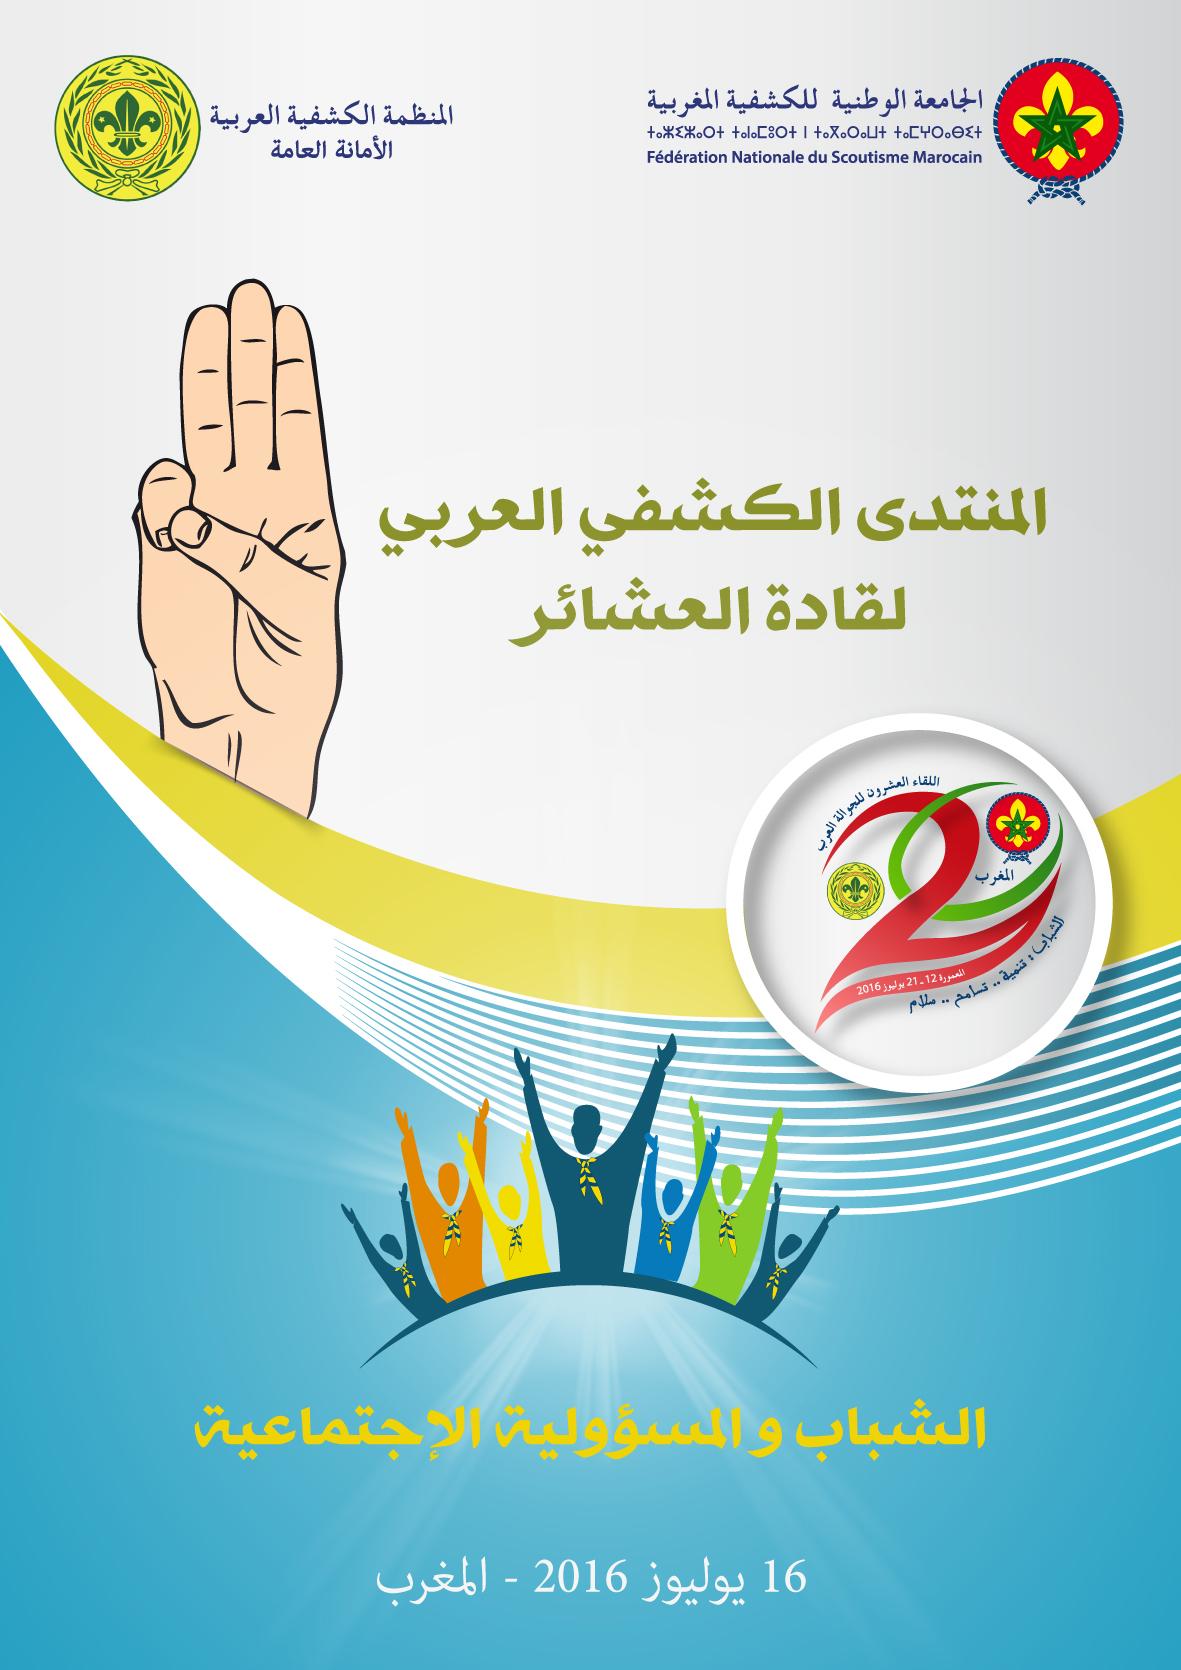 affiche jawala 3